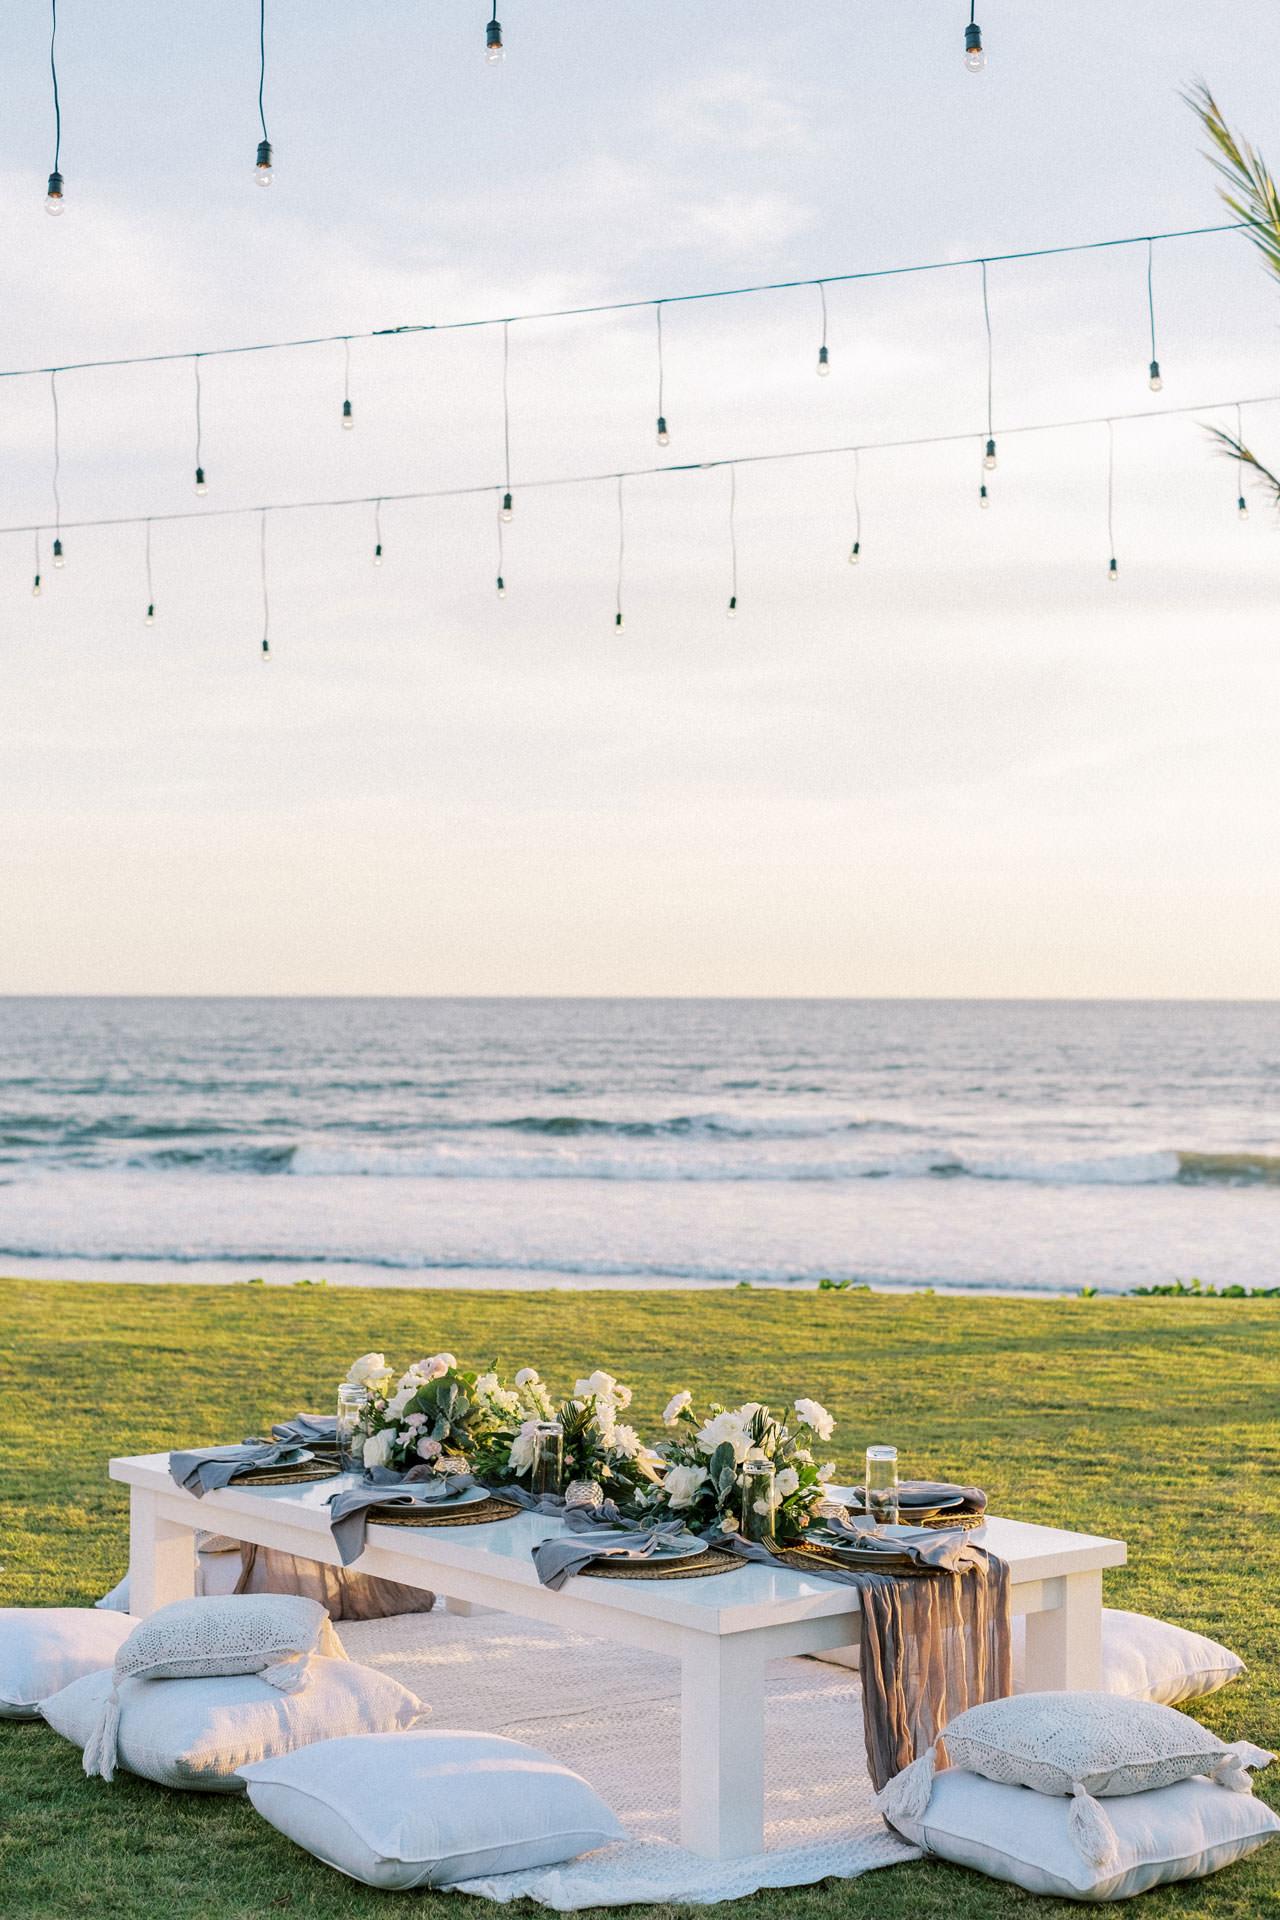 Bali Beach Glamping Wedding on a Luxury Tent 44